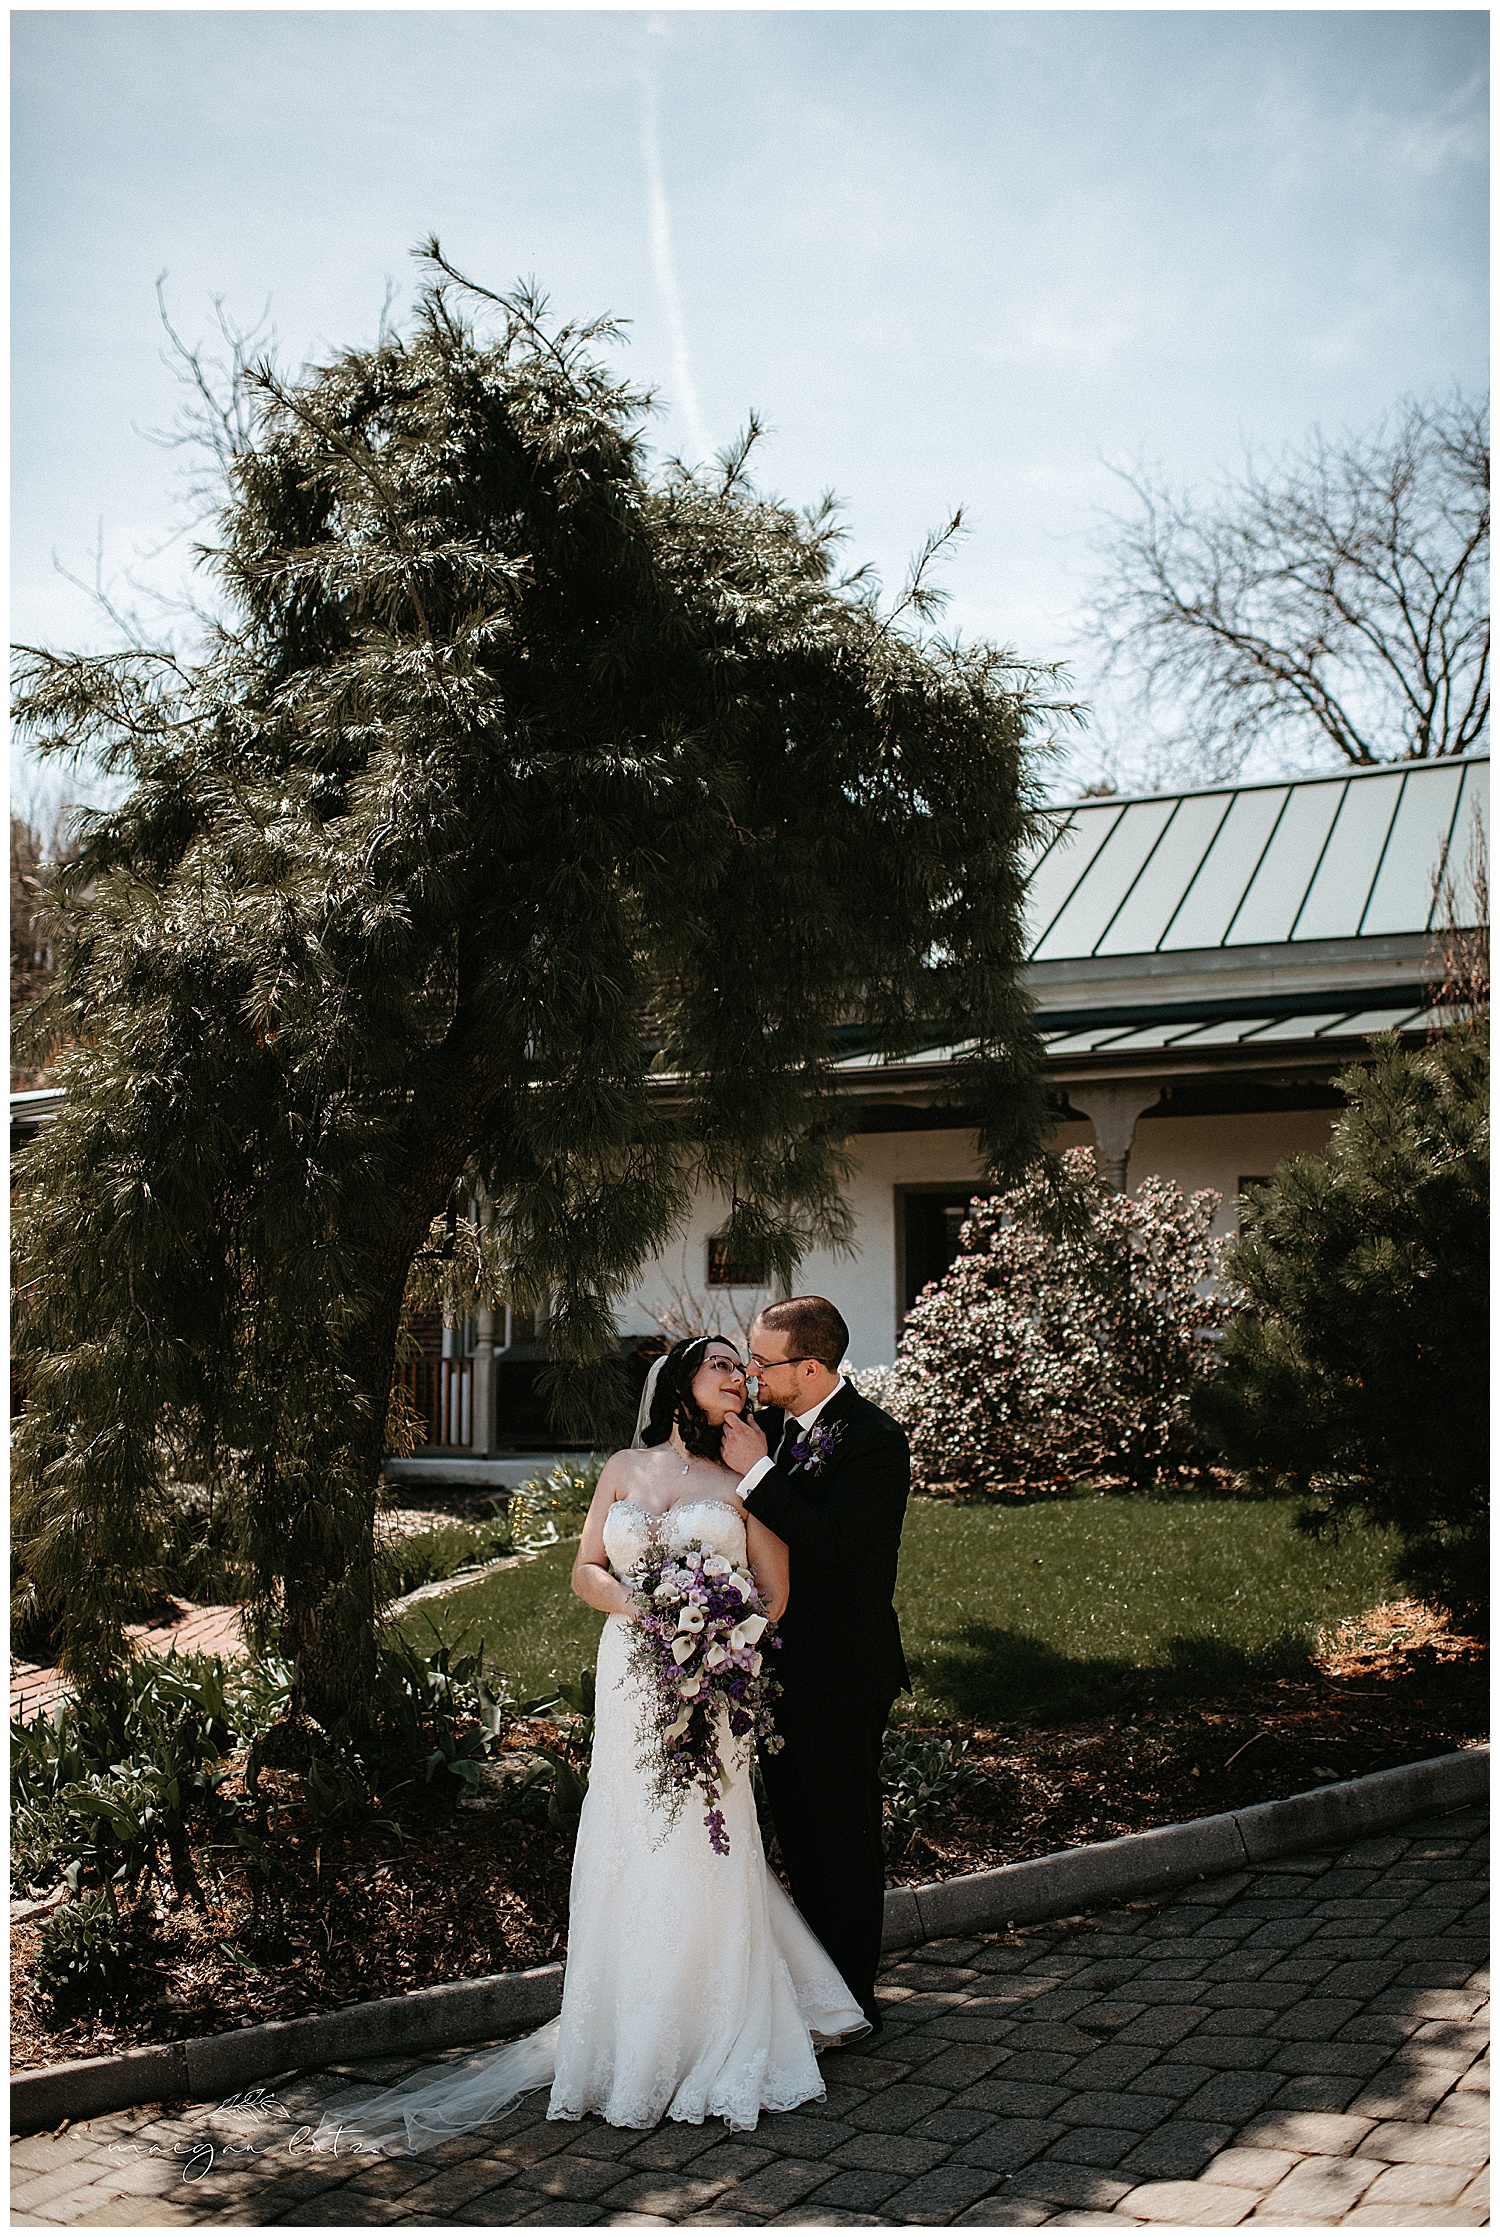 NEPA-wedding-photographer-at-the-glasbern-inn-fogelsvilles-pa_0007.jpg